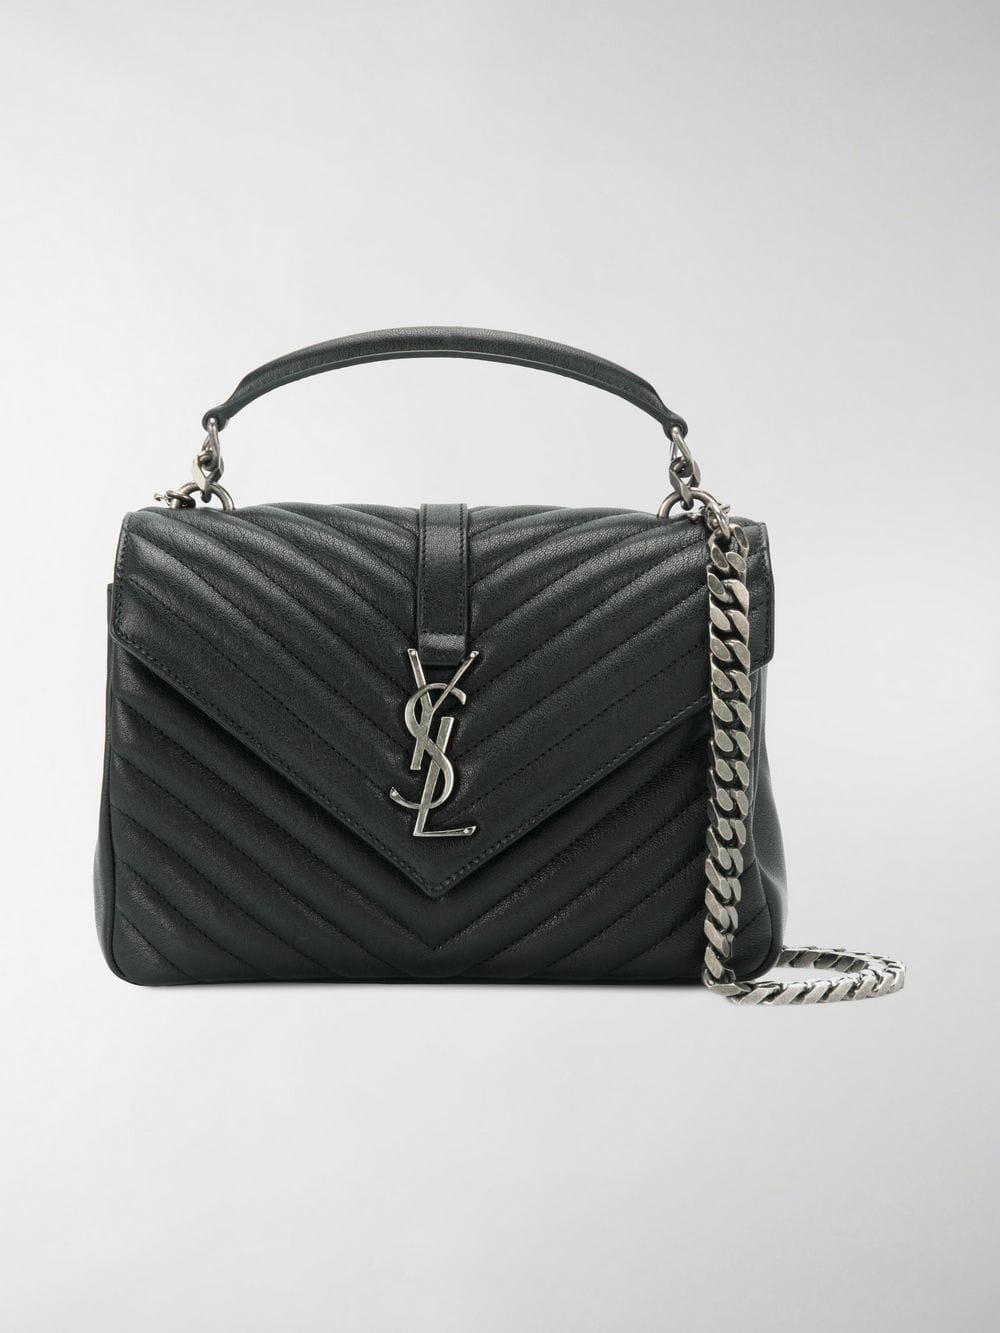 bc6b437dbb Saint Laurent Black College Medium Leather Shoulder Bag in Black - Lyst